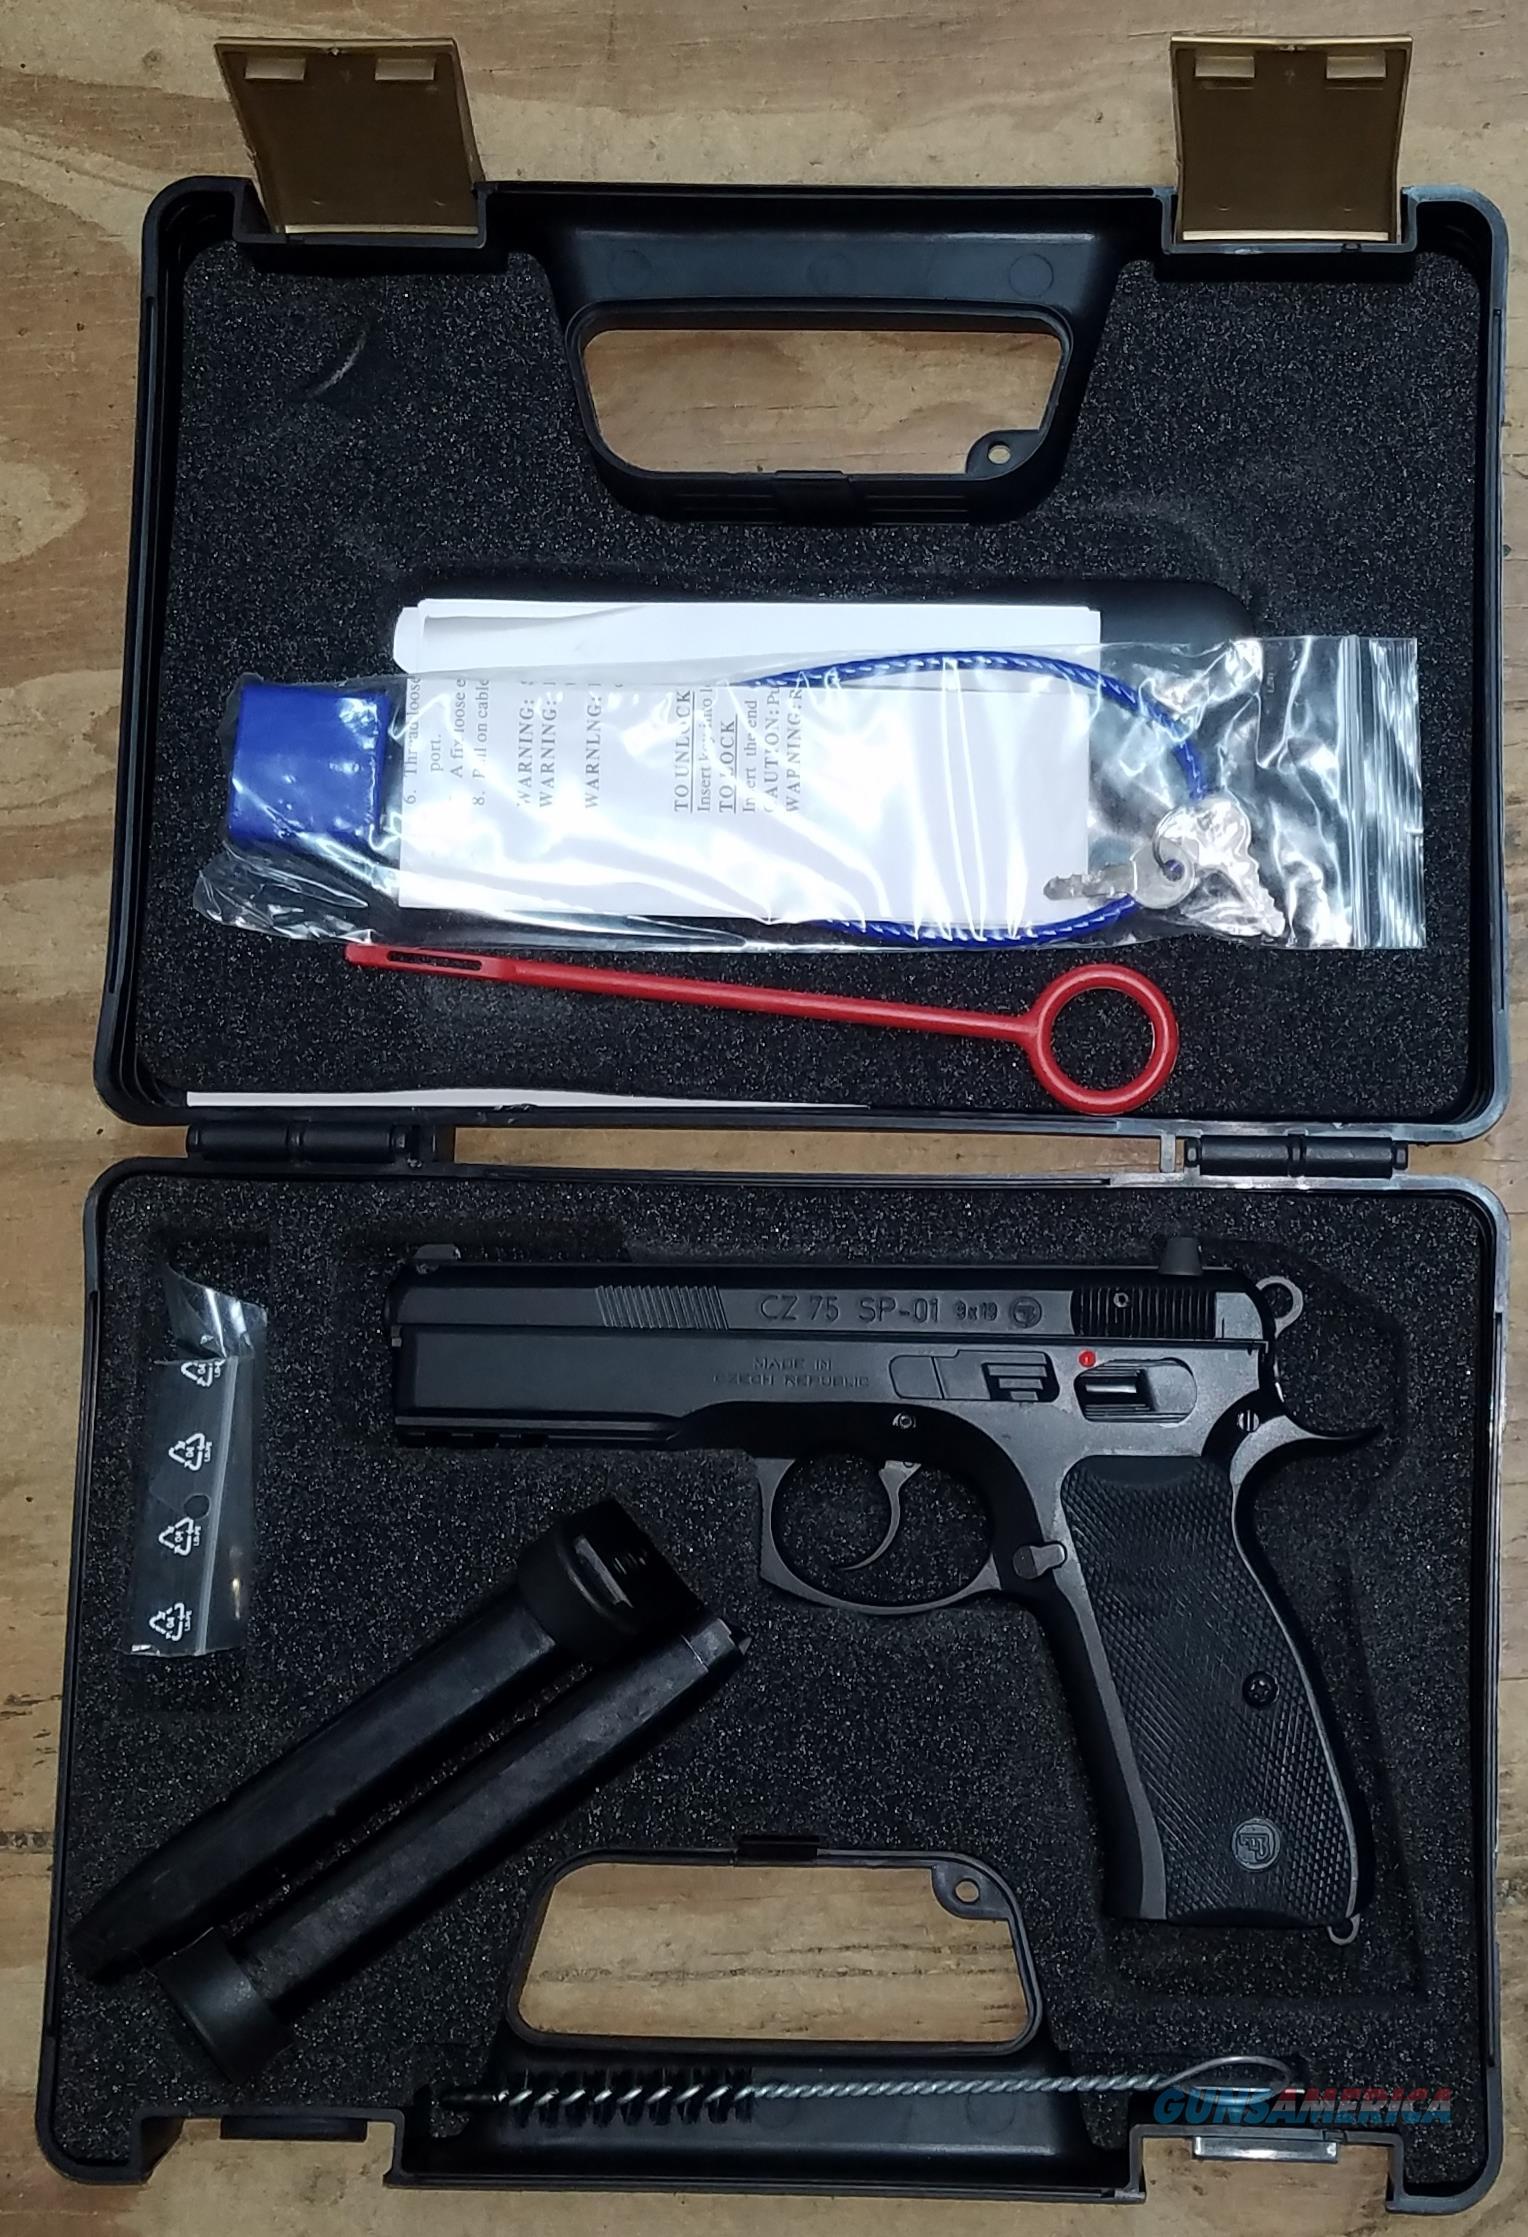 CZ USA 9MM Black Luger CZ 75 SP01 Handgun 91153  Guns > Pistols > CZ Pistols